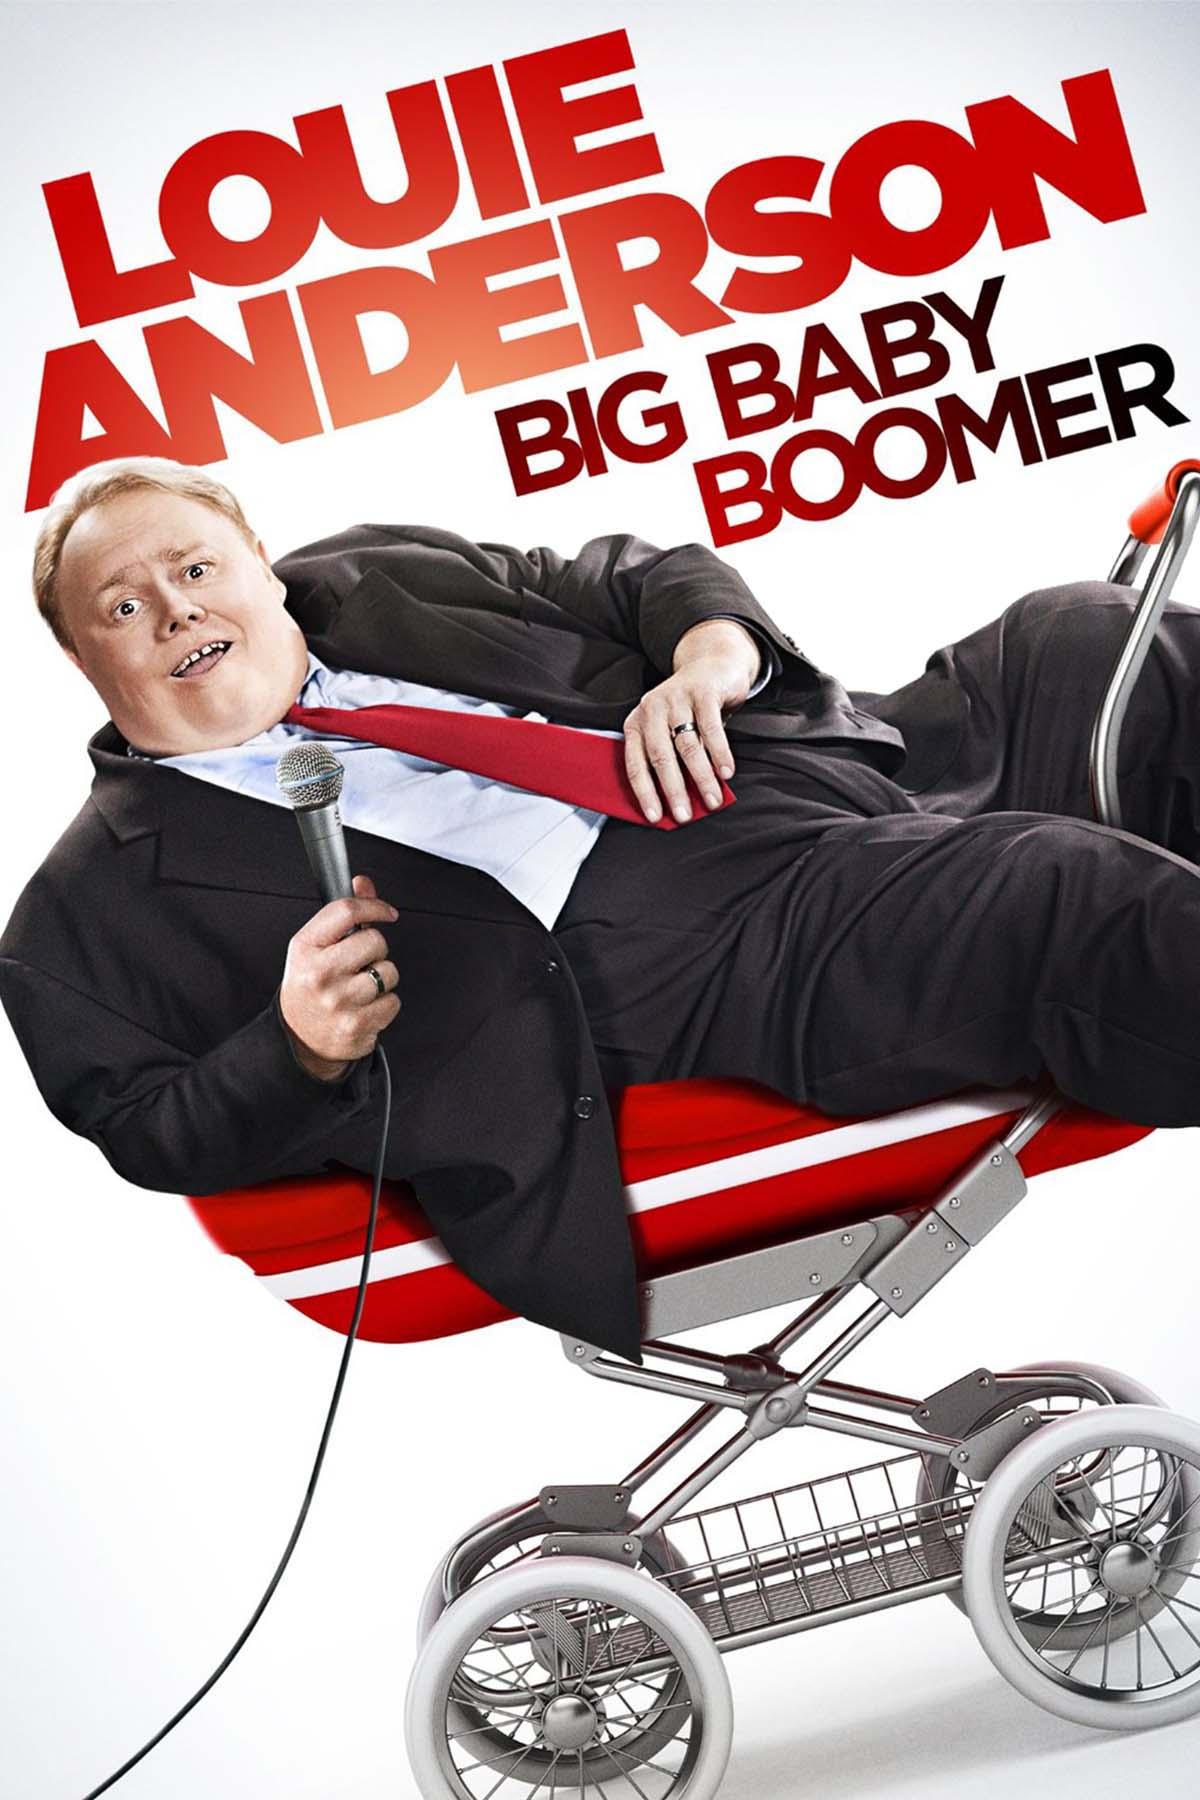 Louie Anderson: Big Baby Boomer - Comedy Dynamics